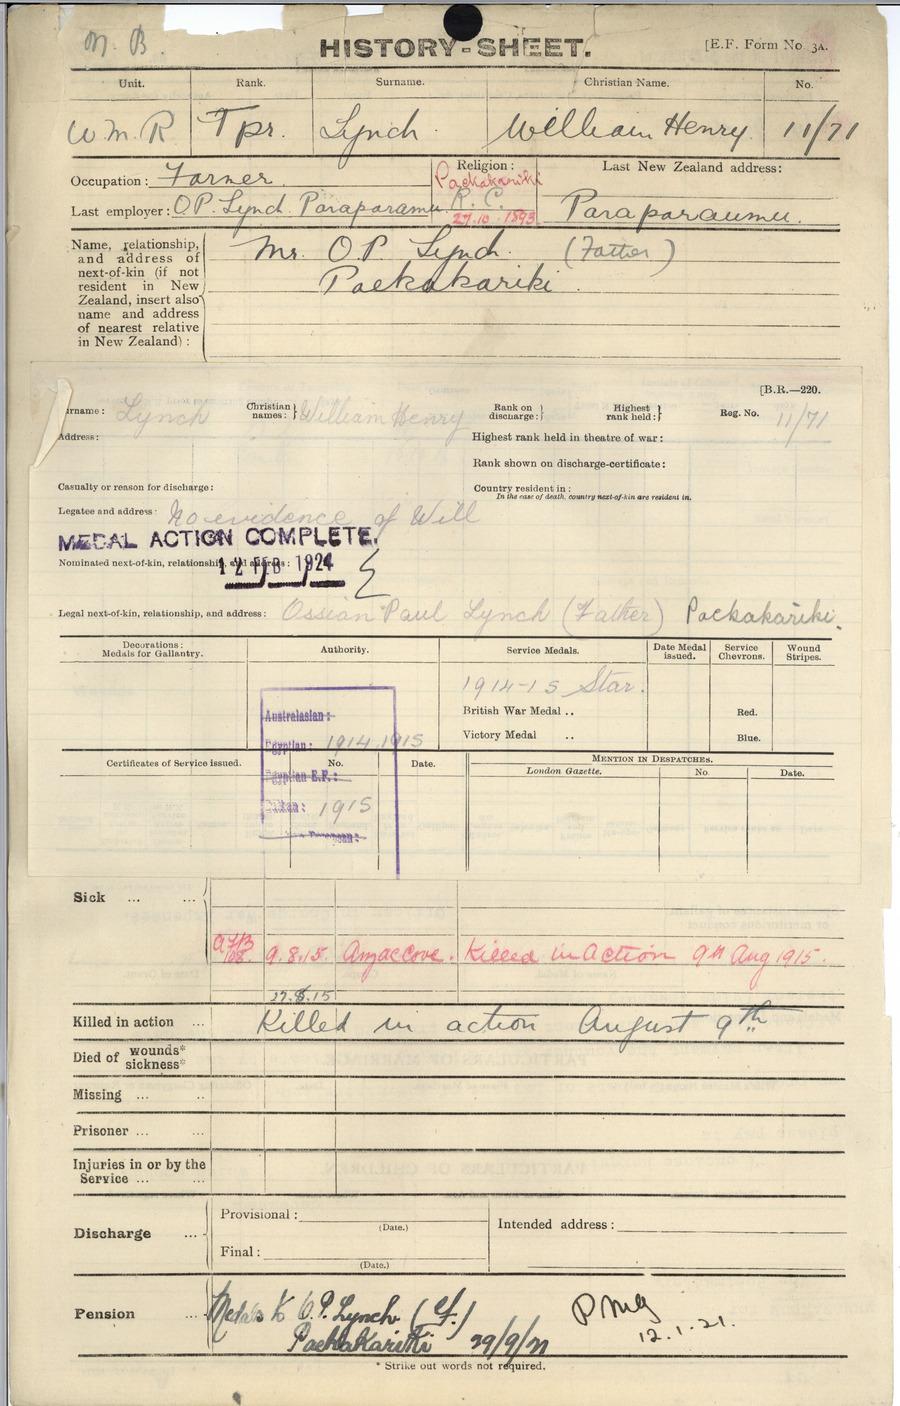 Lynch WH History Sheet